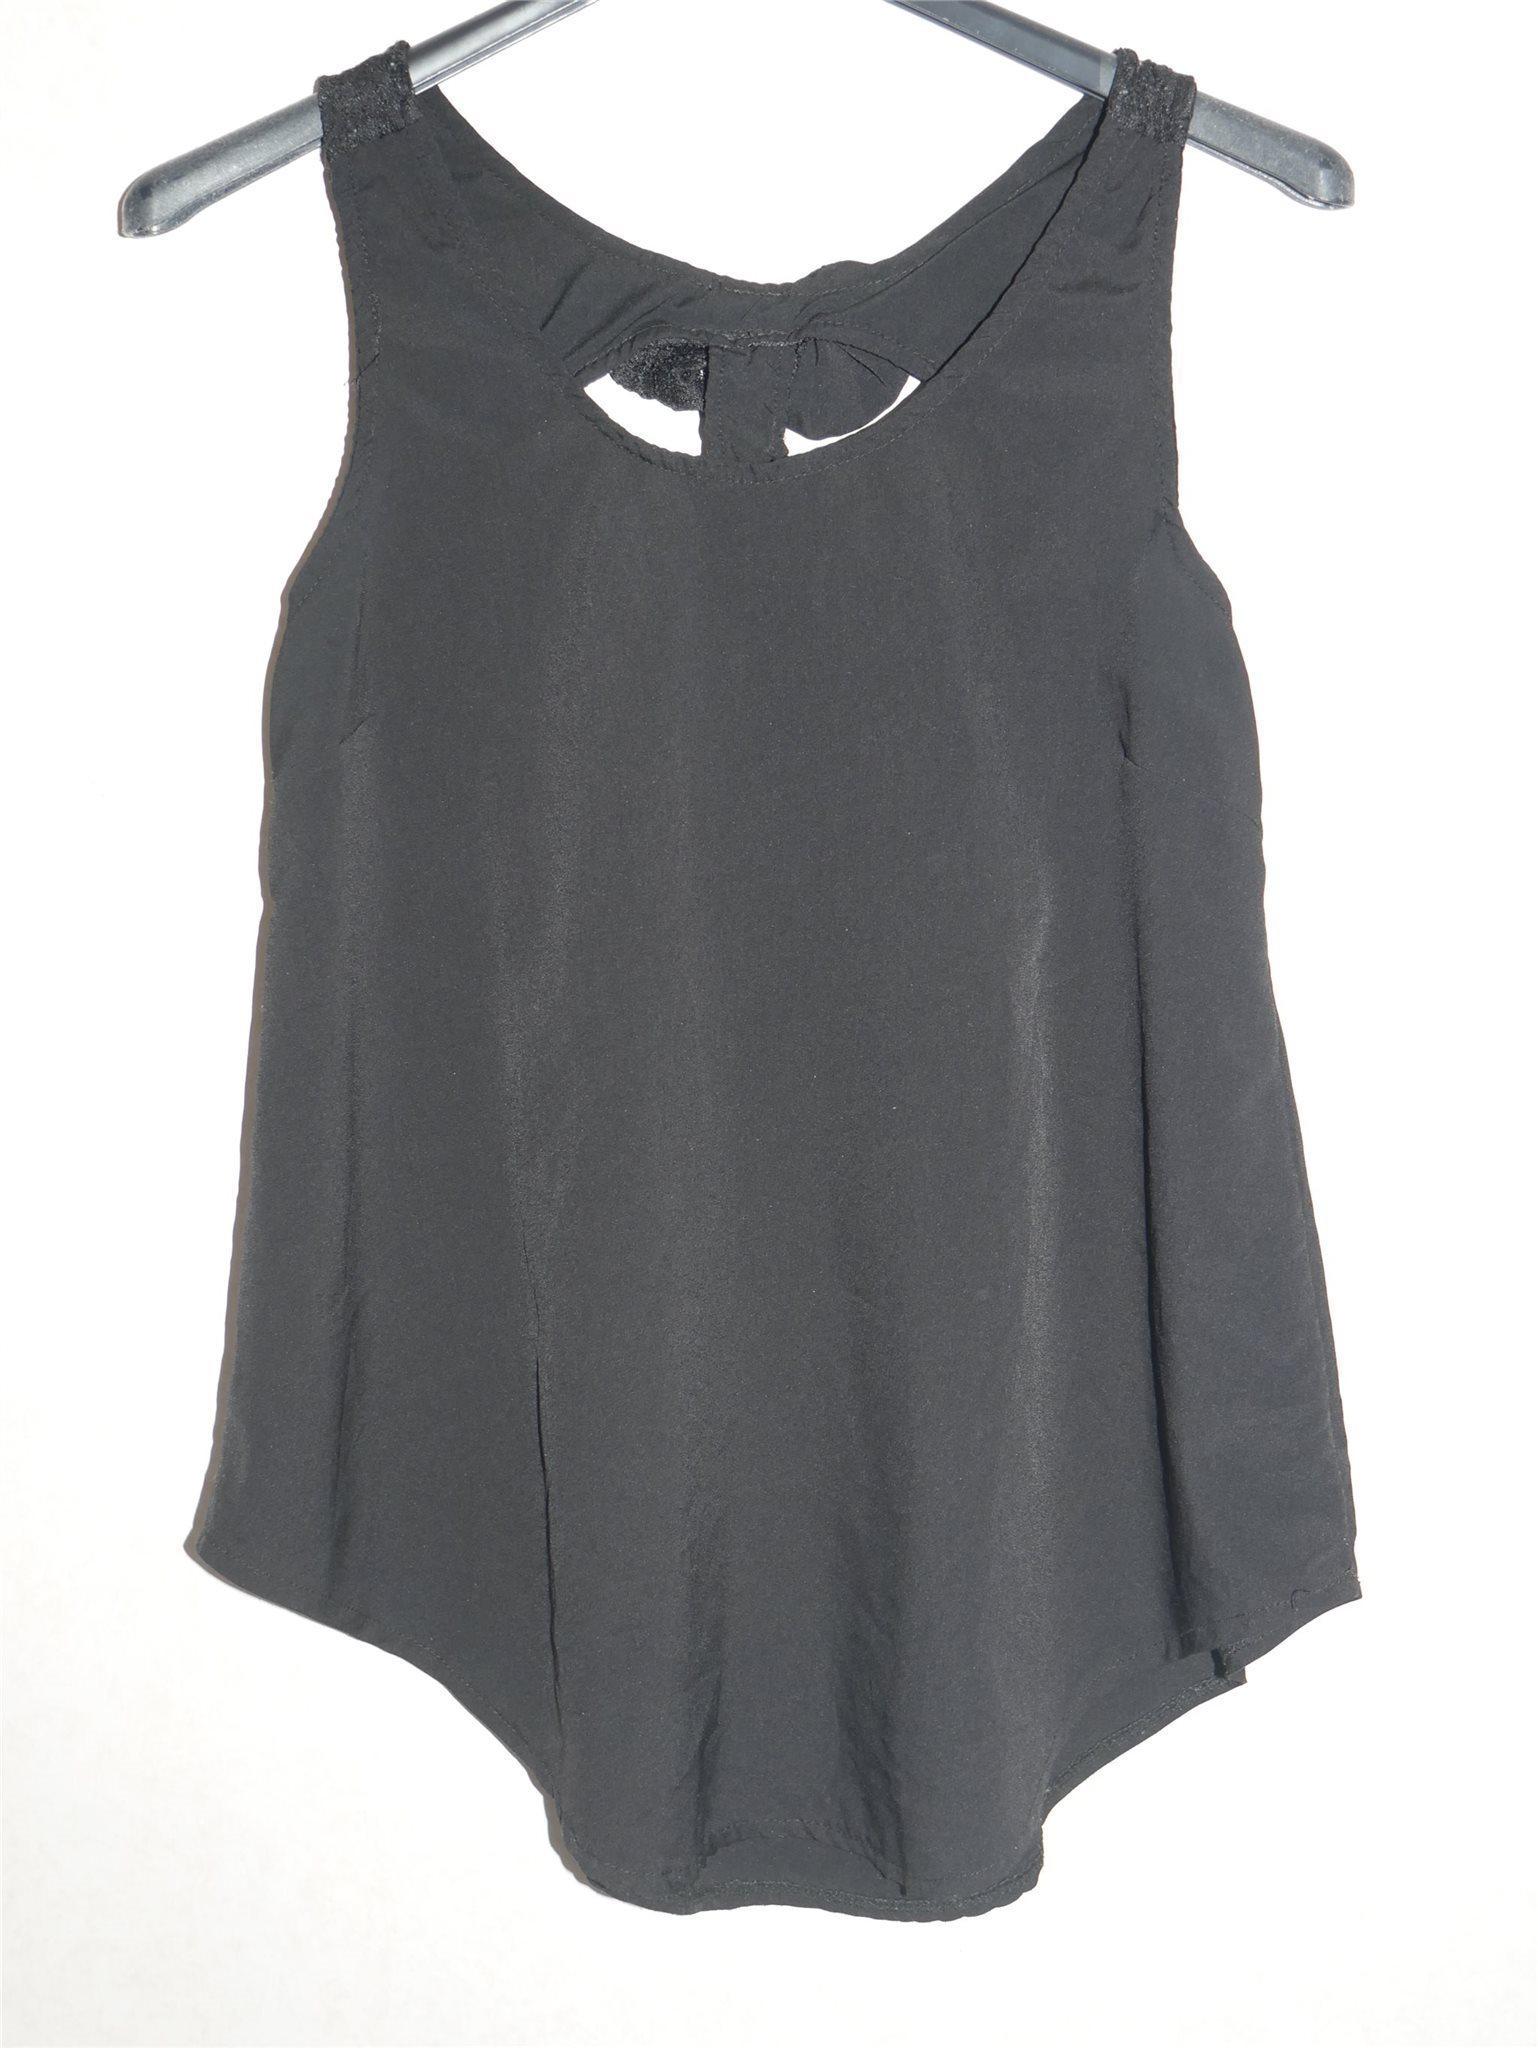 svart linne spets